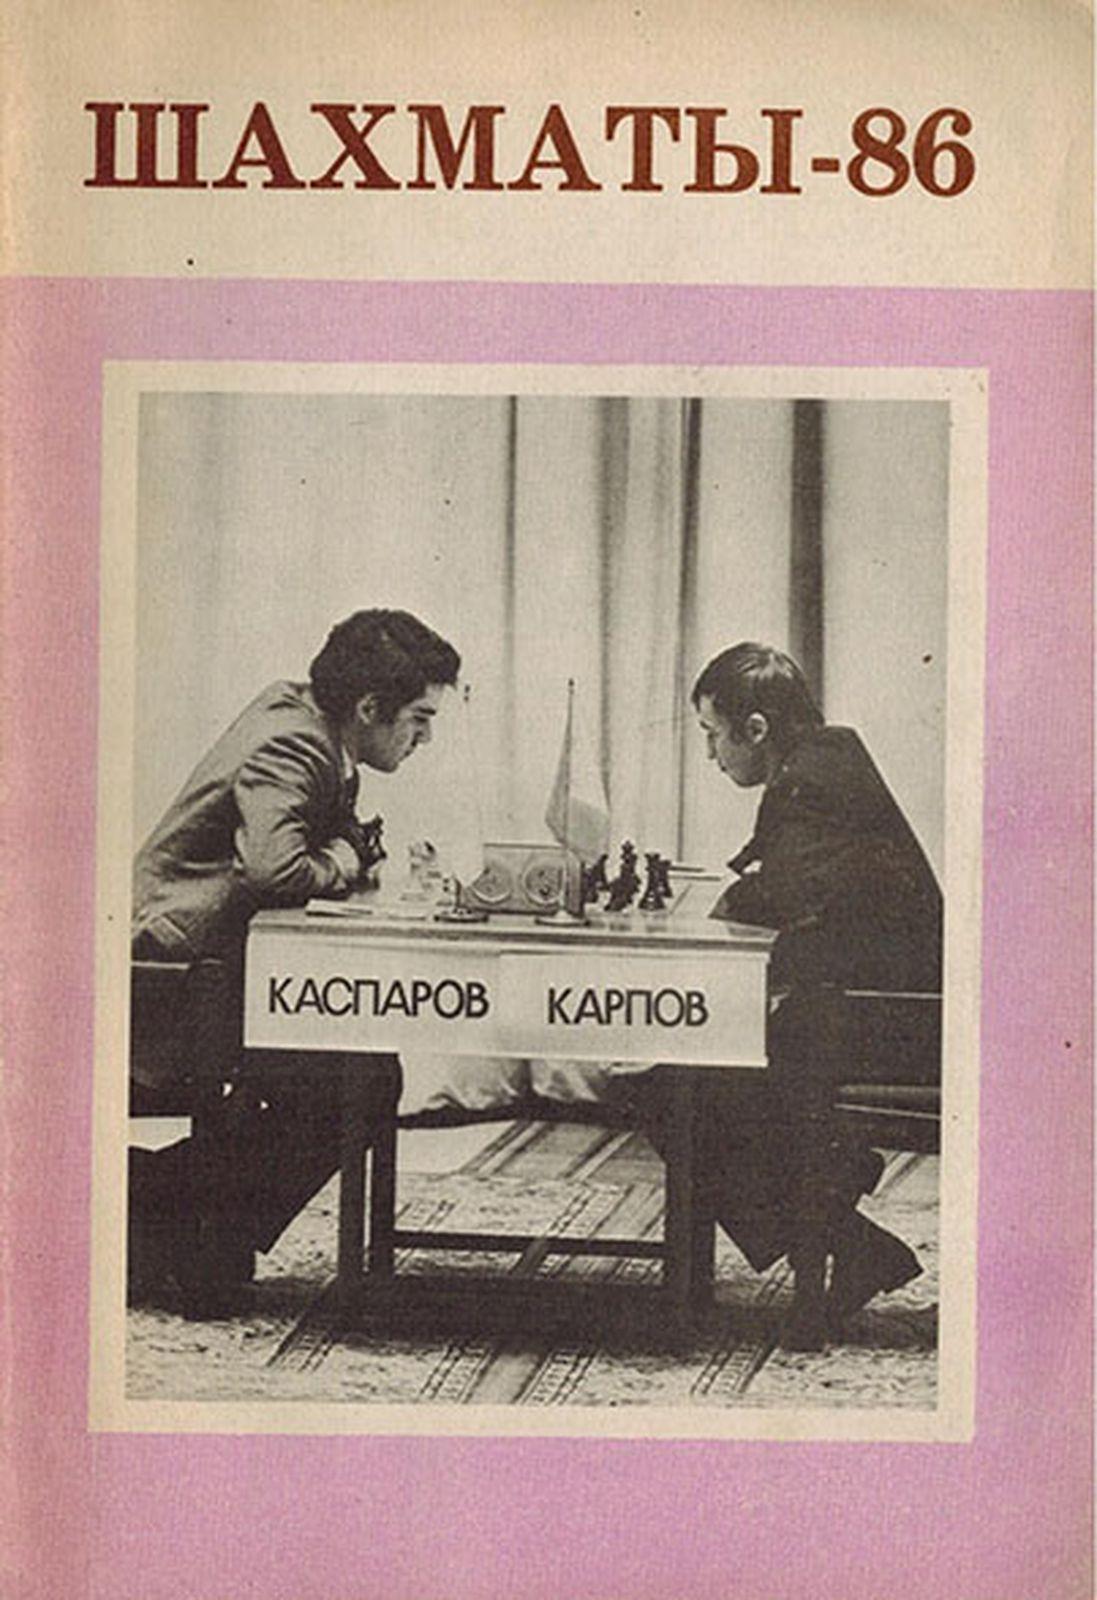 Шахматы - 86. Справочник любителя шахмат